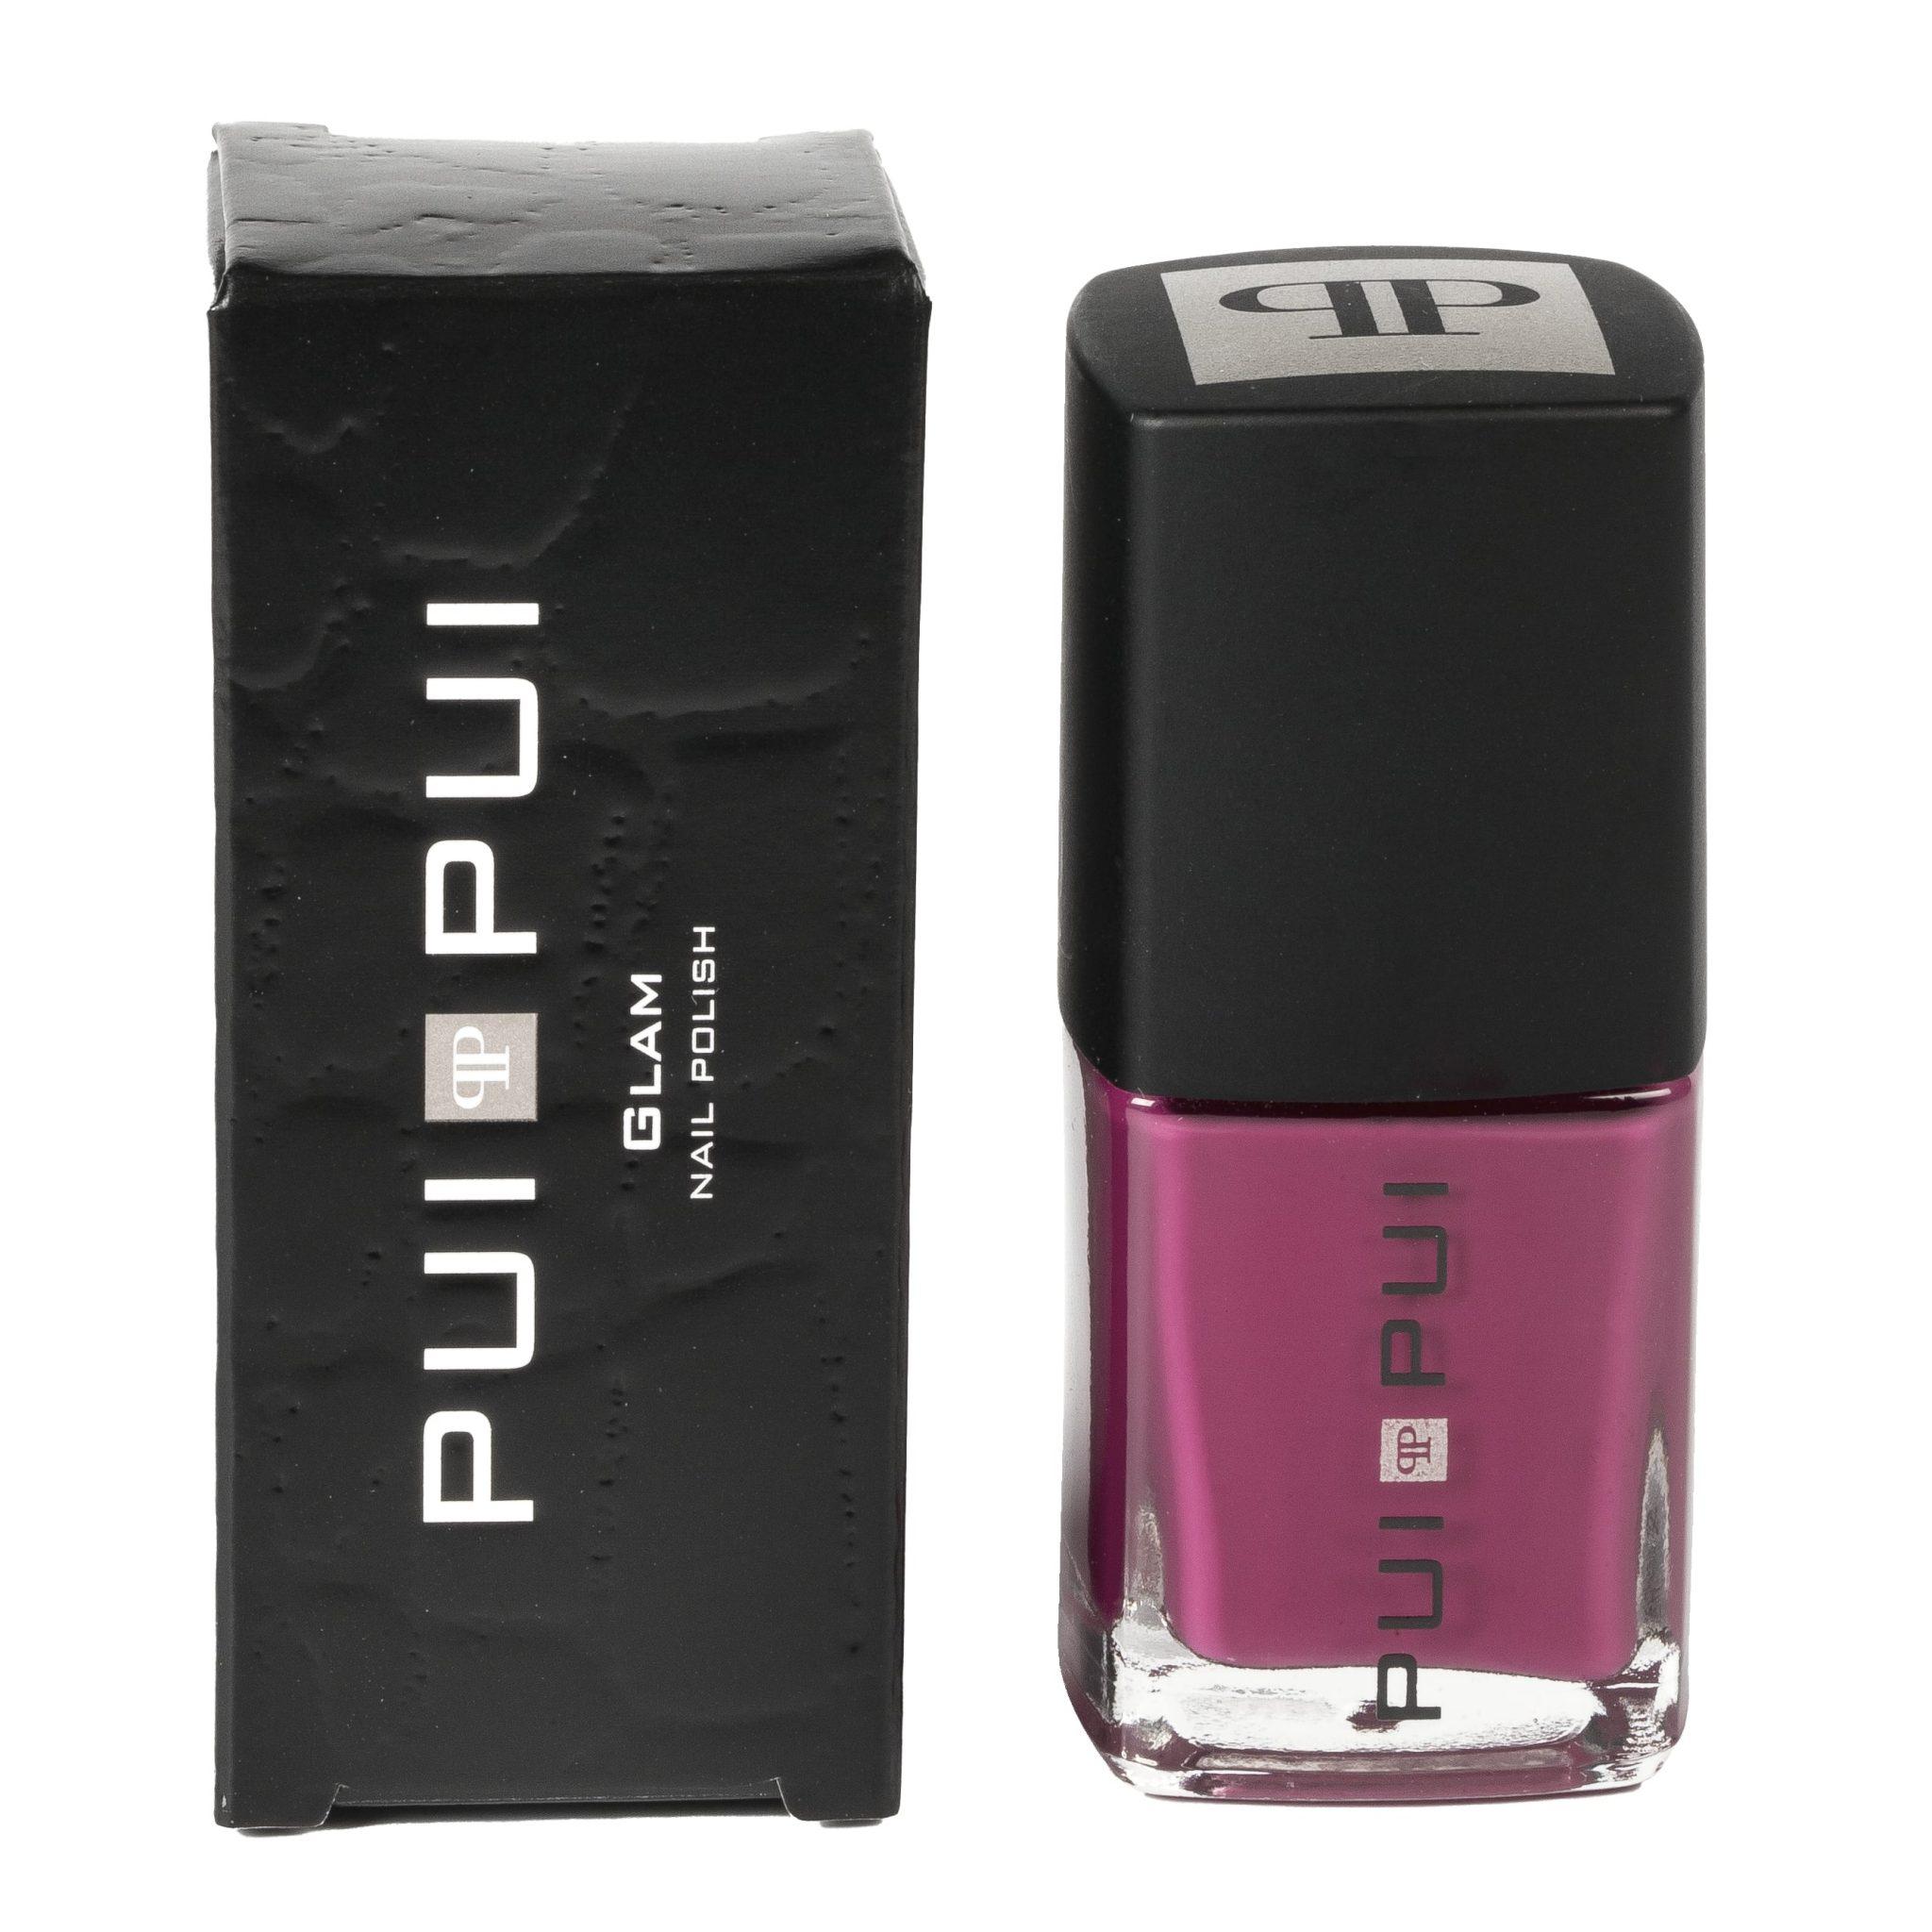 27506 glam nail polish - vrij